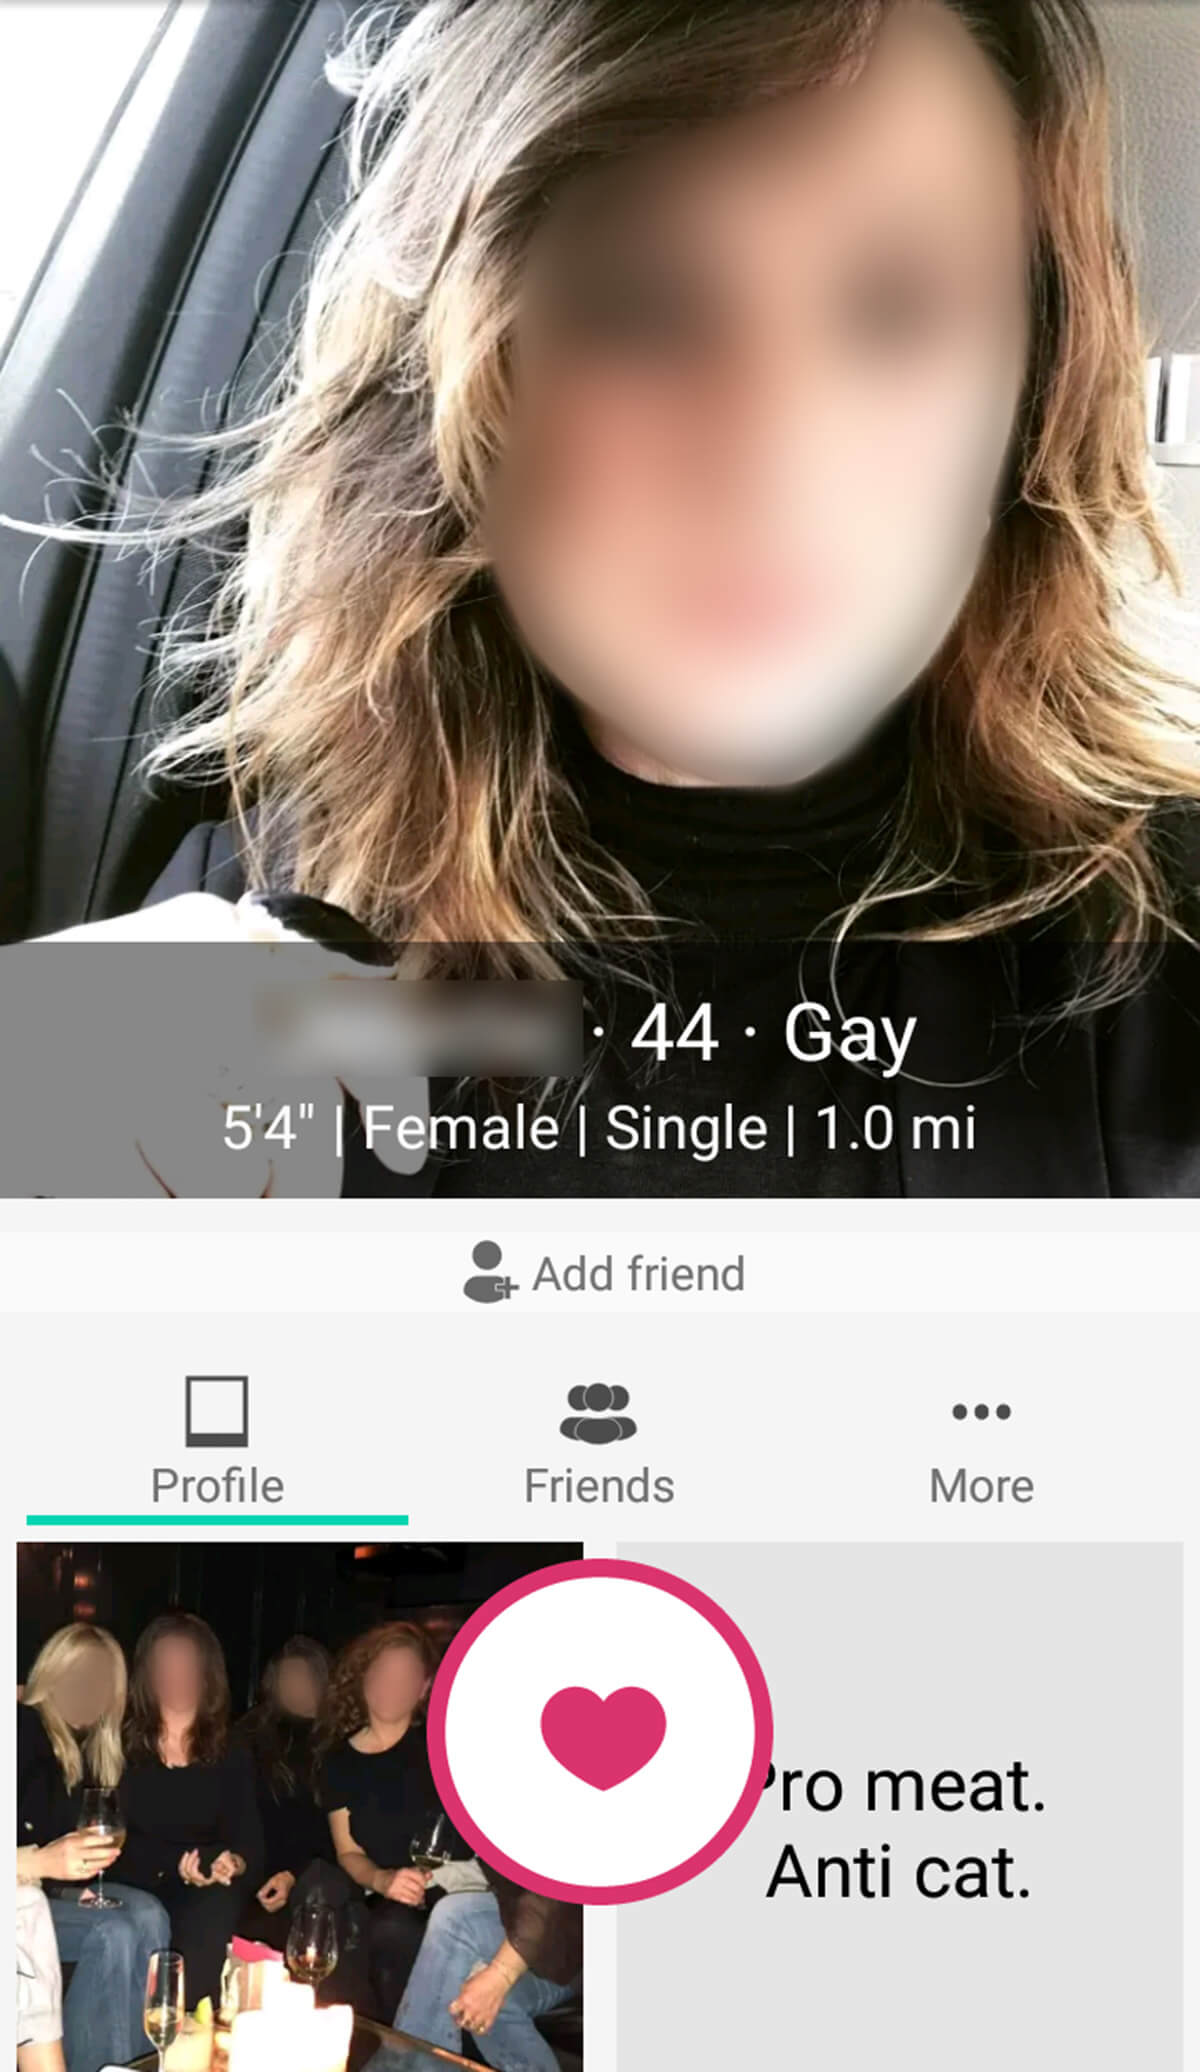 Lesbo dating apps Melbourne nopeus dating NJ yli 40